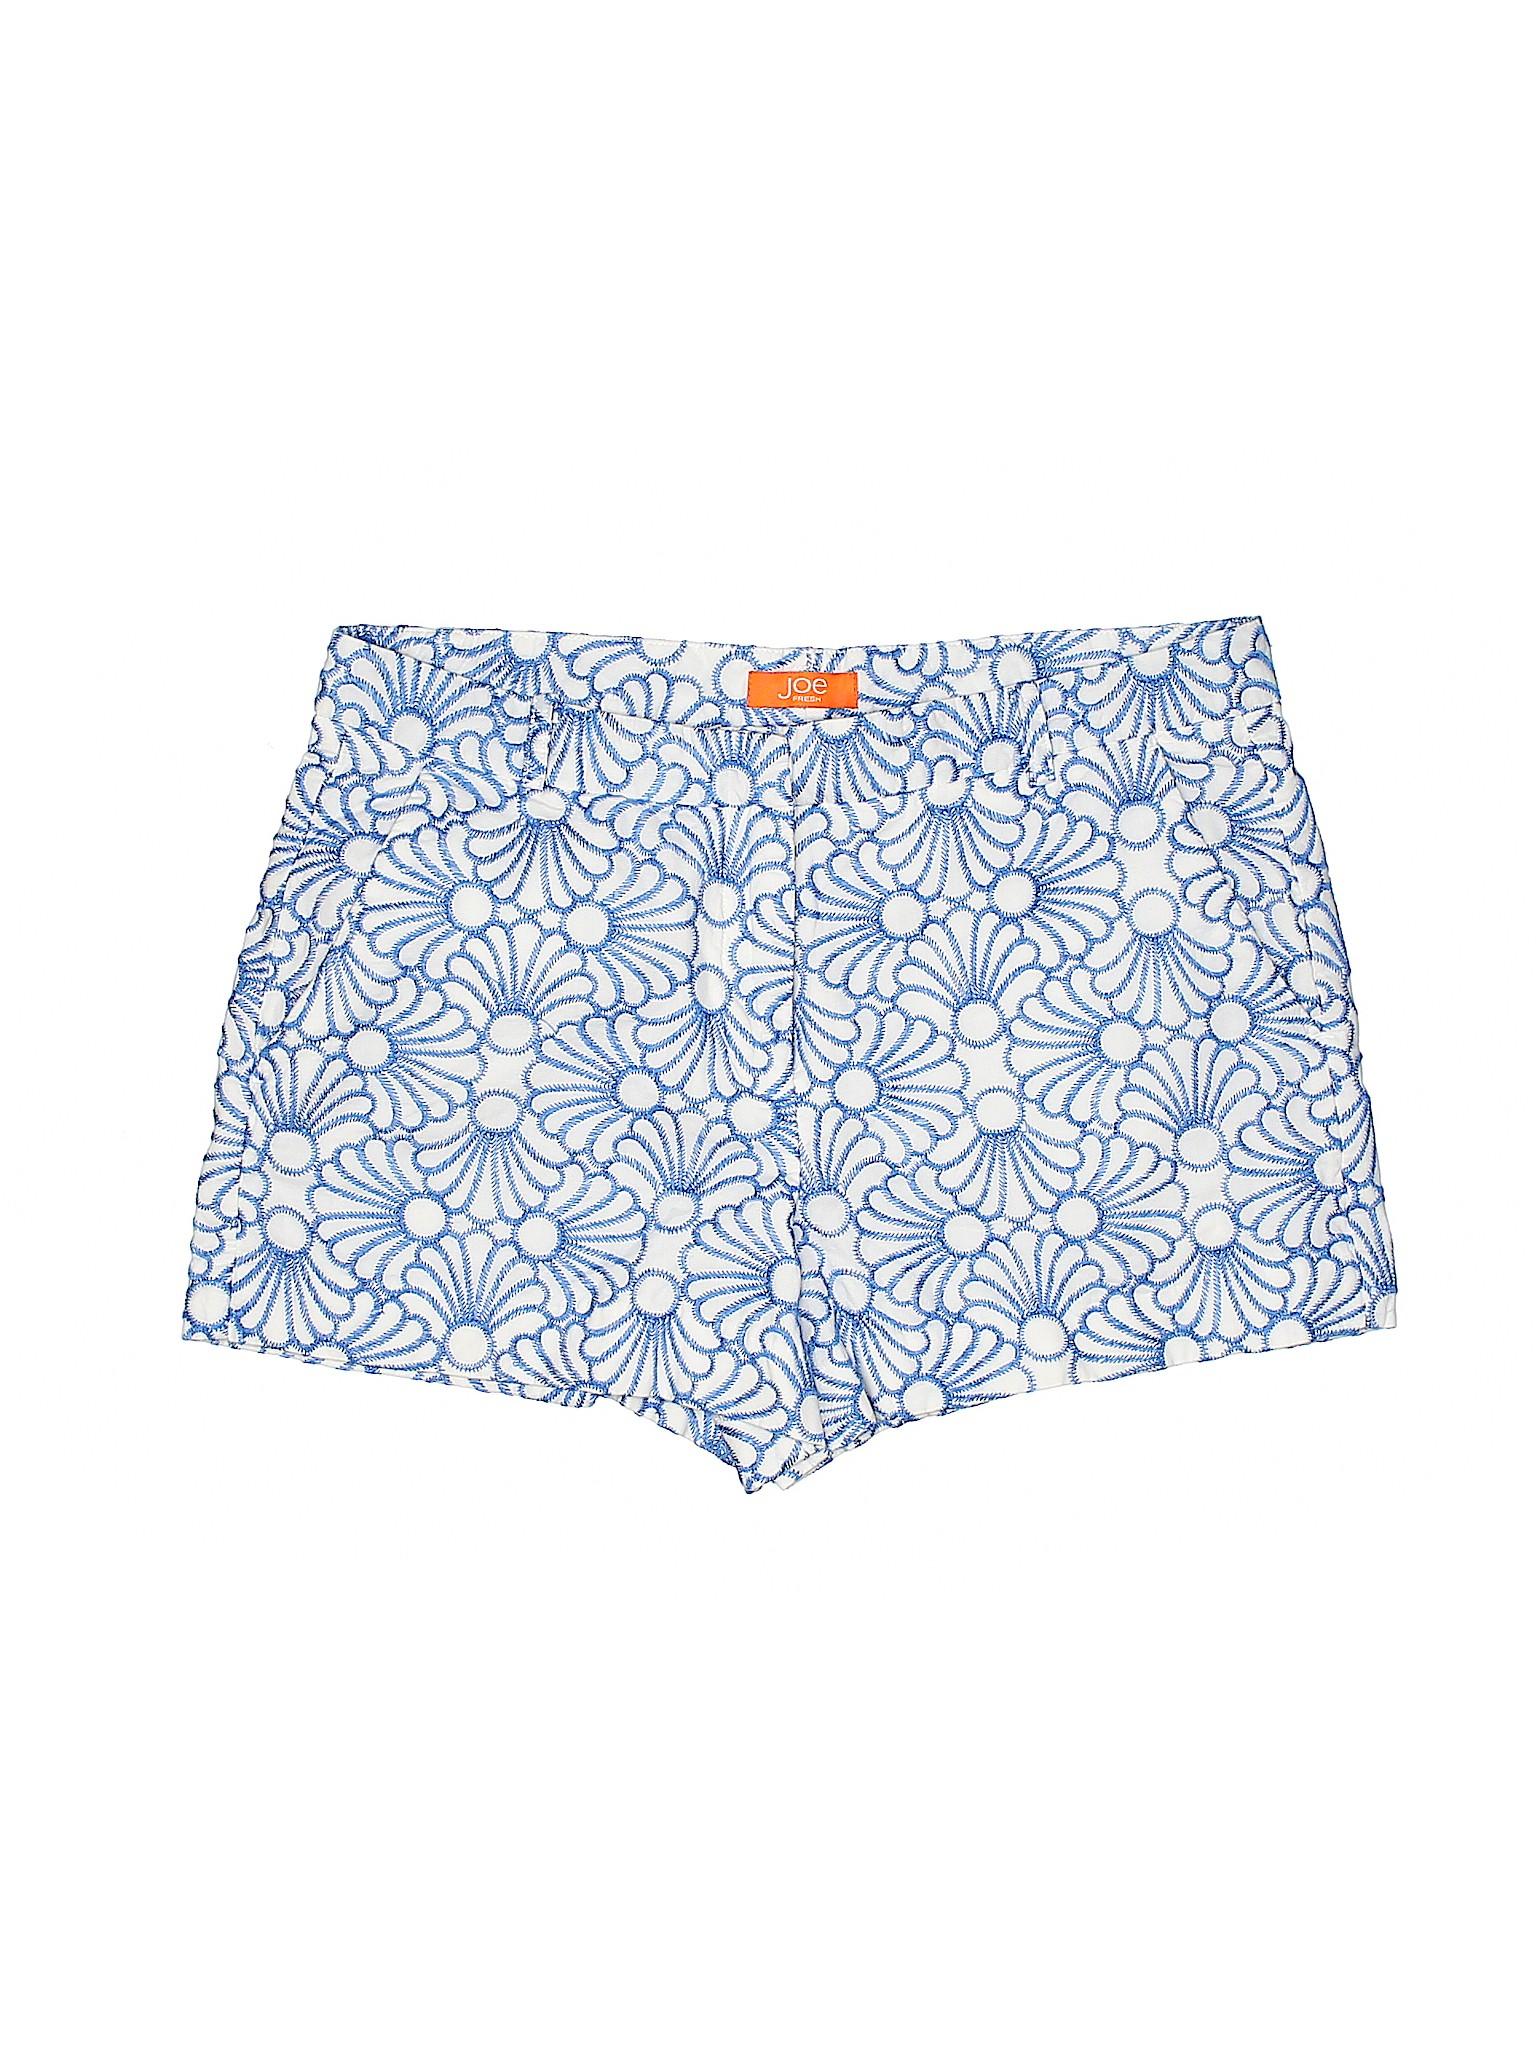 Shorts Leisure Joe Fresh Khaki winter qwzwH04S